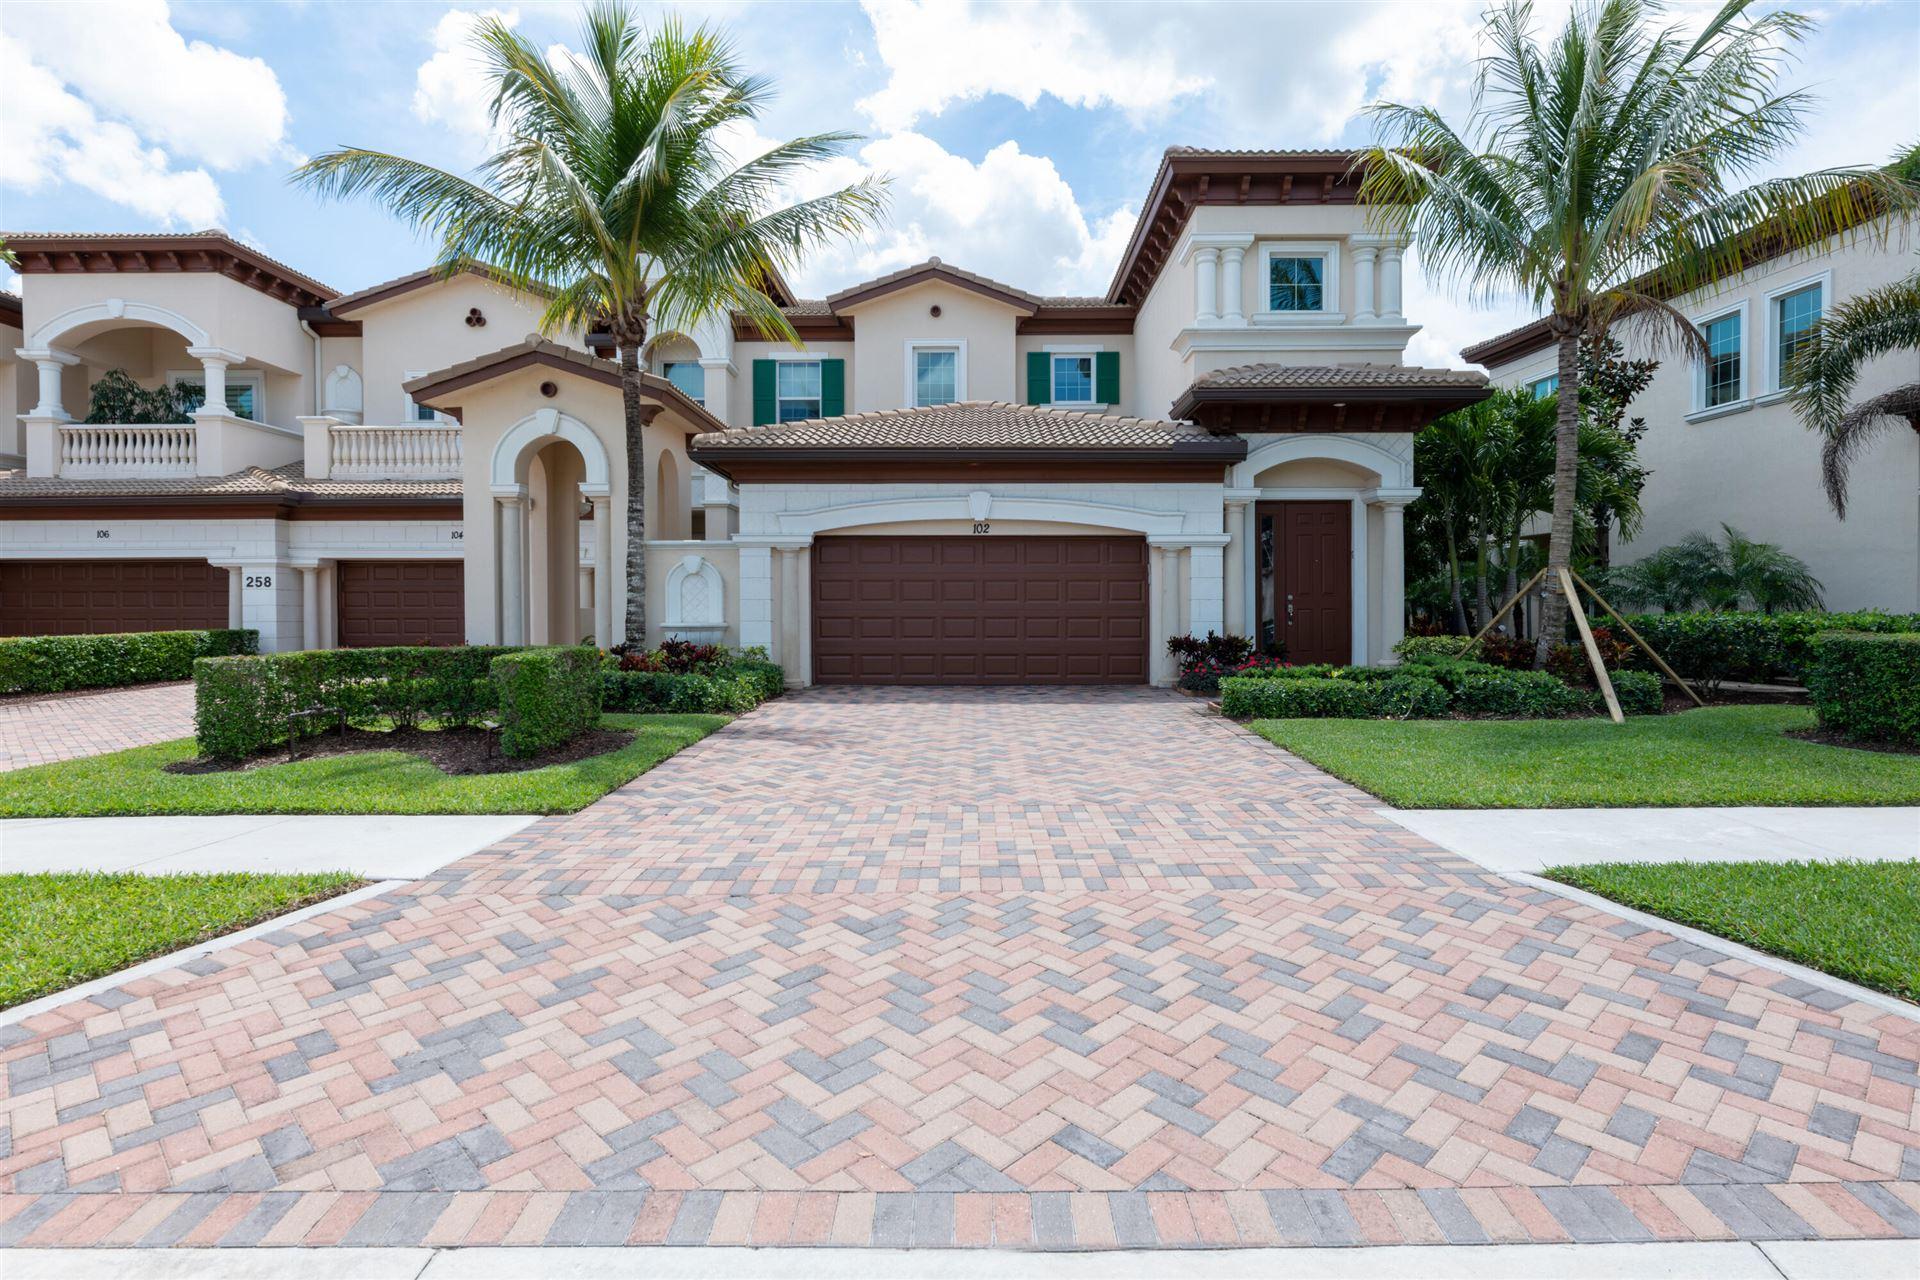 Photo of 258 Tresana Boulevard #102, Jupiter, FL 33478 (MLS # RX-10706887)